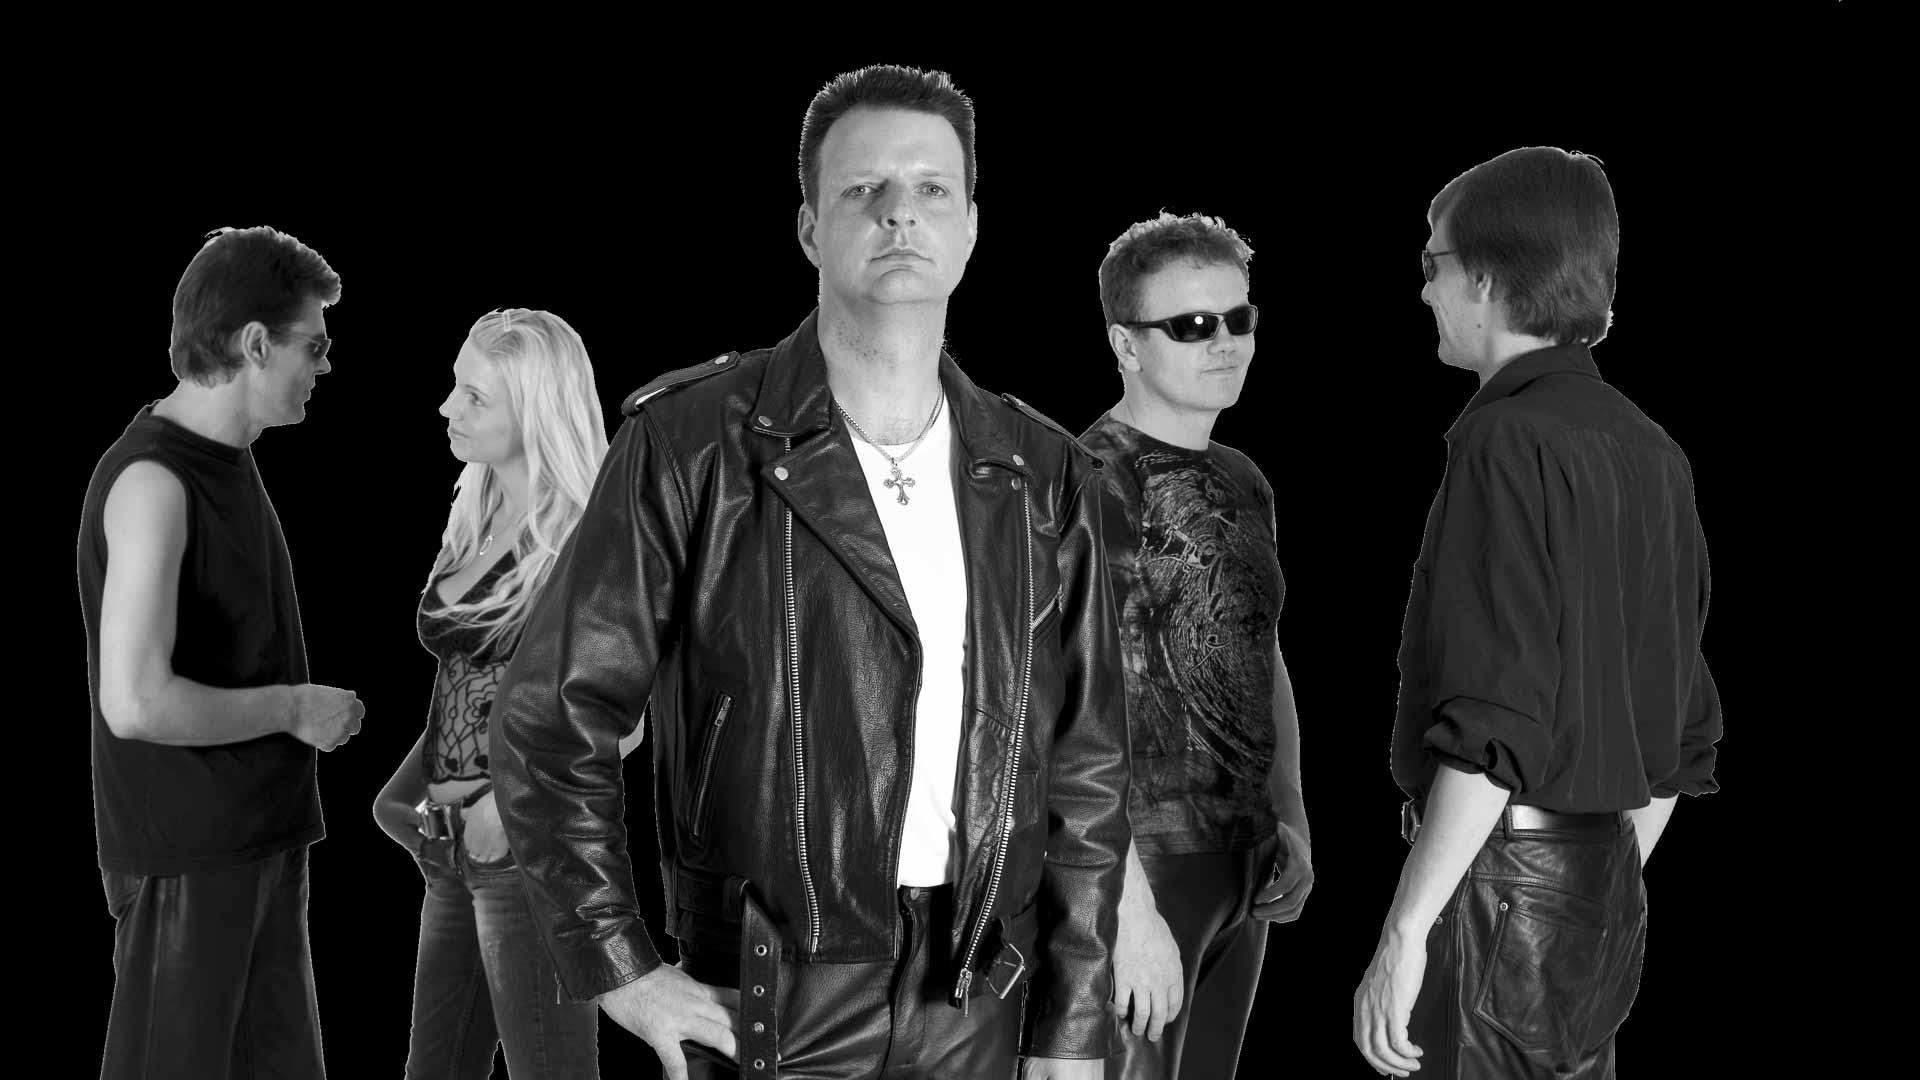 Depeche Road - die Depeche Mode Coverband